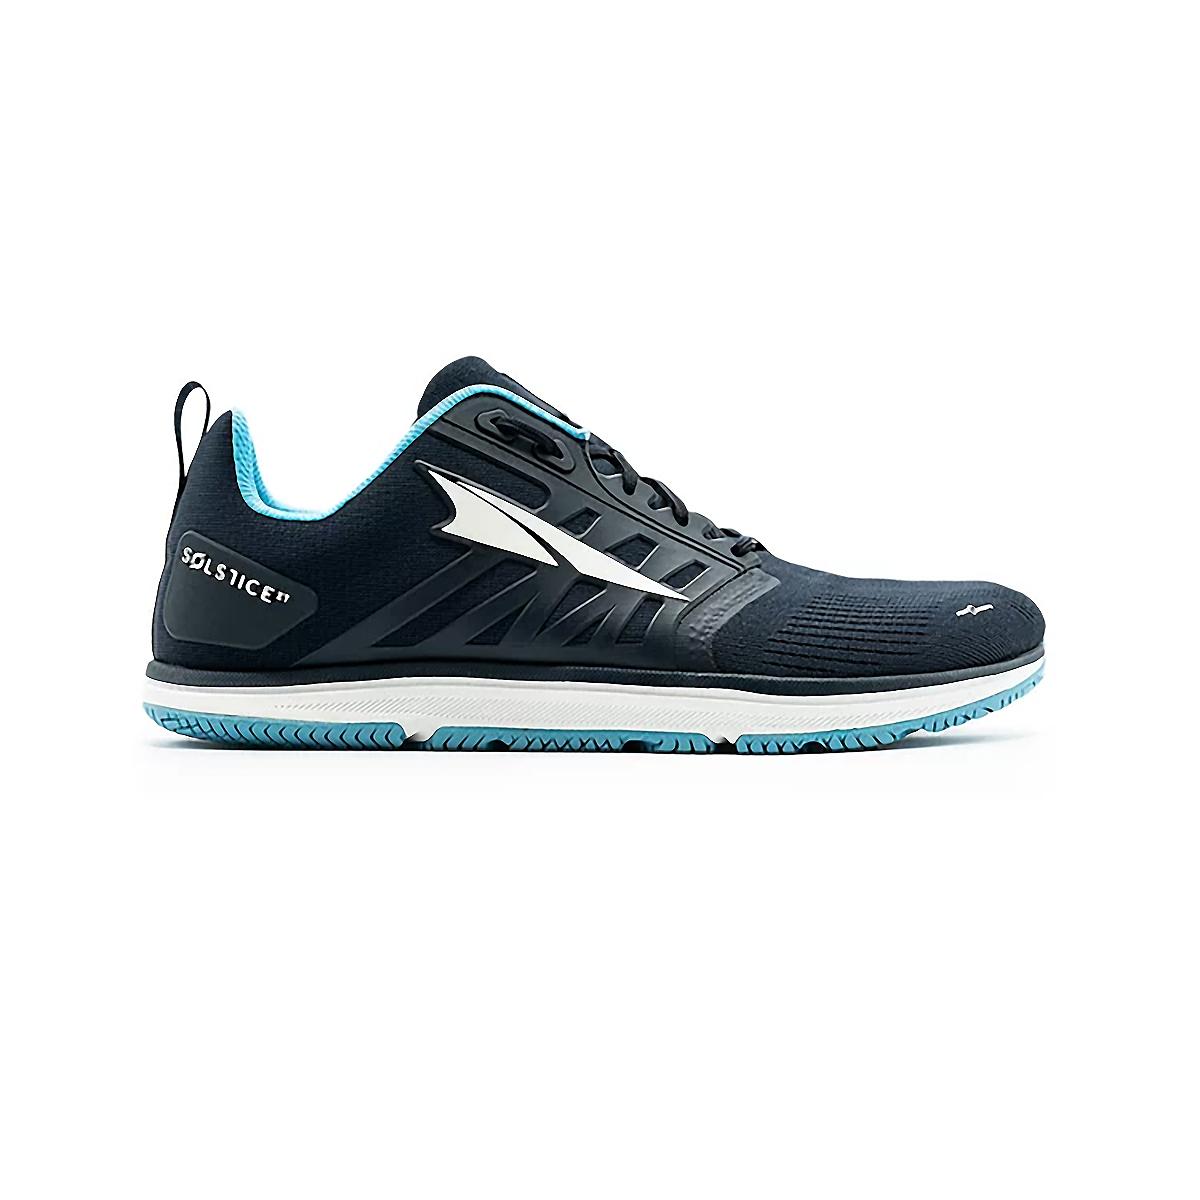 Men's Altra Solstice XT Training Shoes - Color: Navy/Light Blue - Size: 9.5 - Width: Regular, Navy/Light Blue, large, image 1